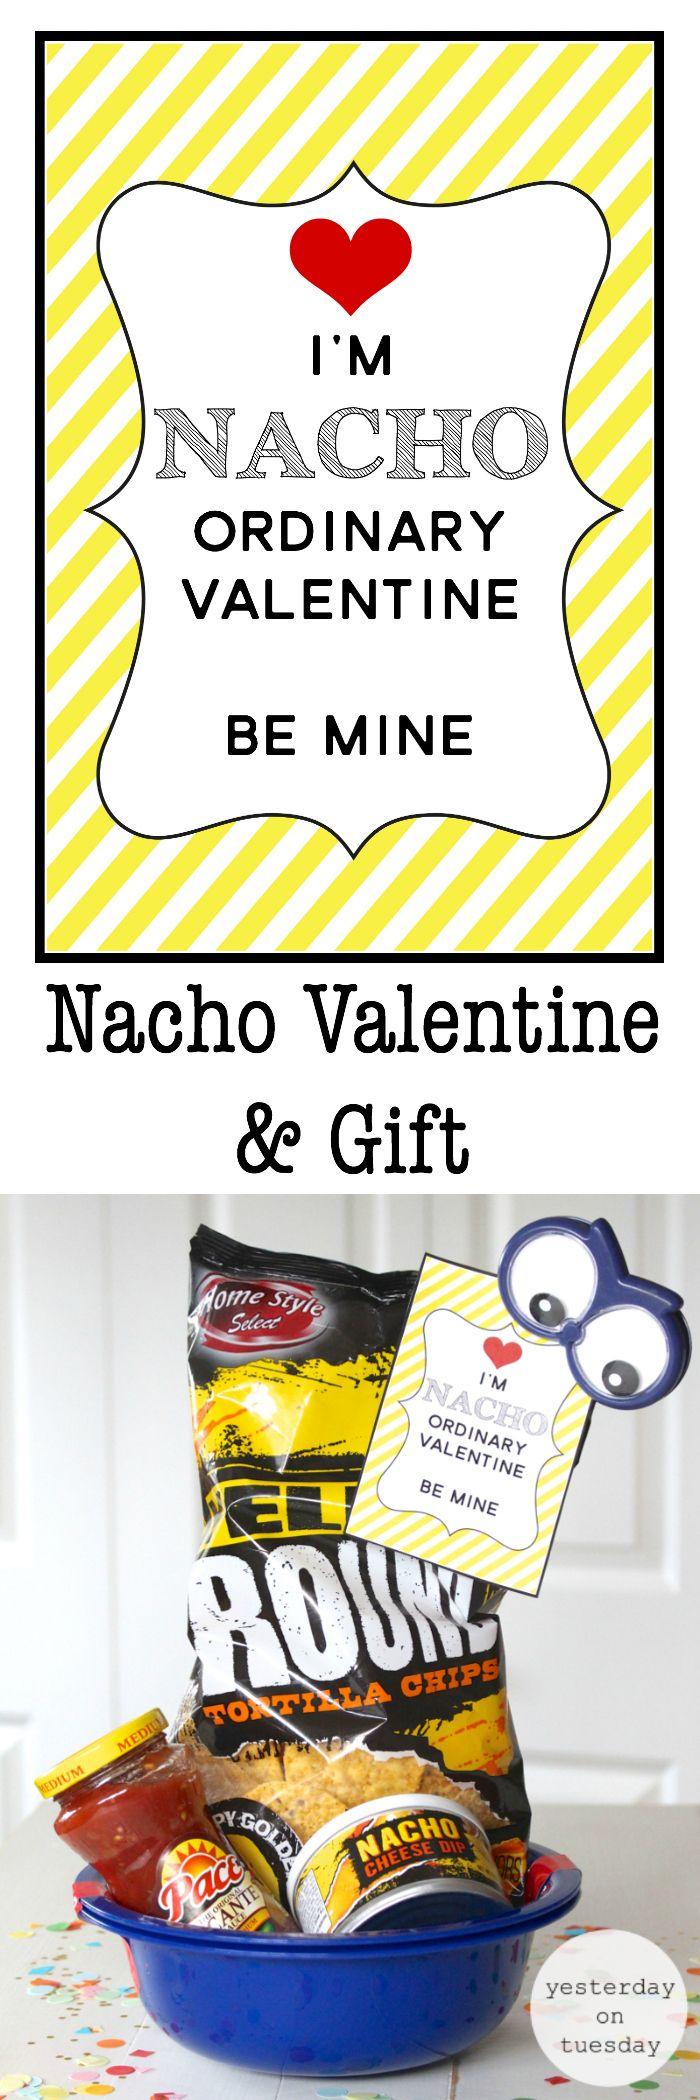 Nacho Valentine and Gift Funny Nacho Ordinary Valentine, a free printable fun wi...